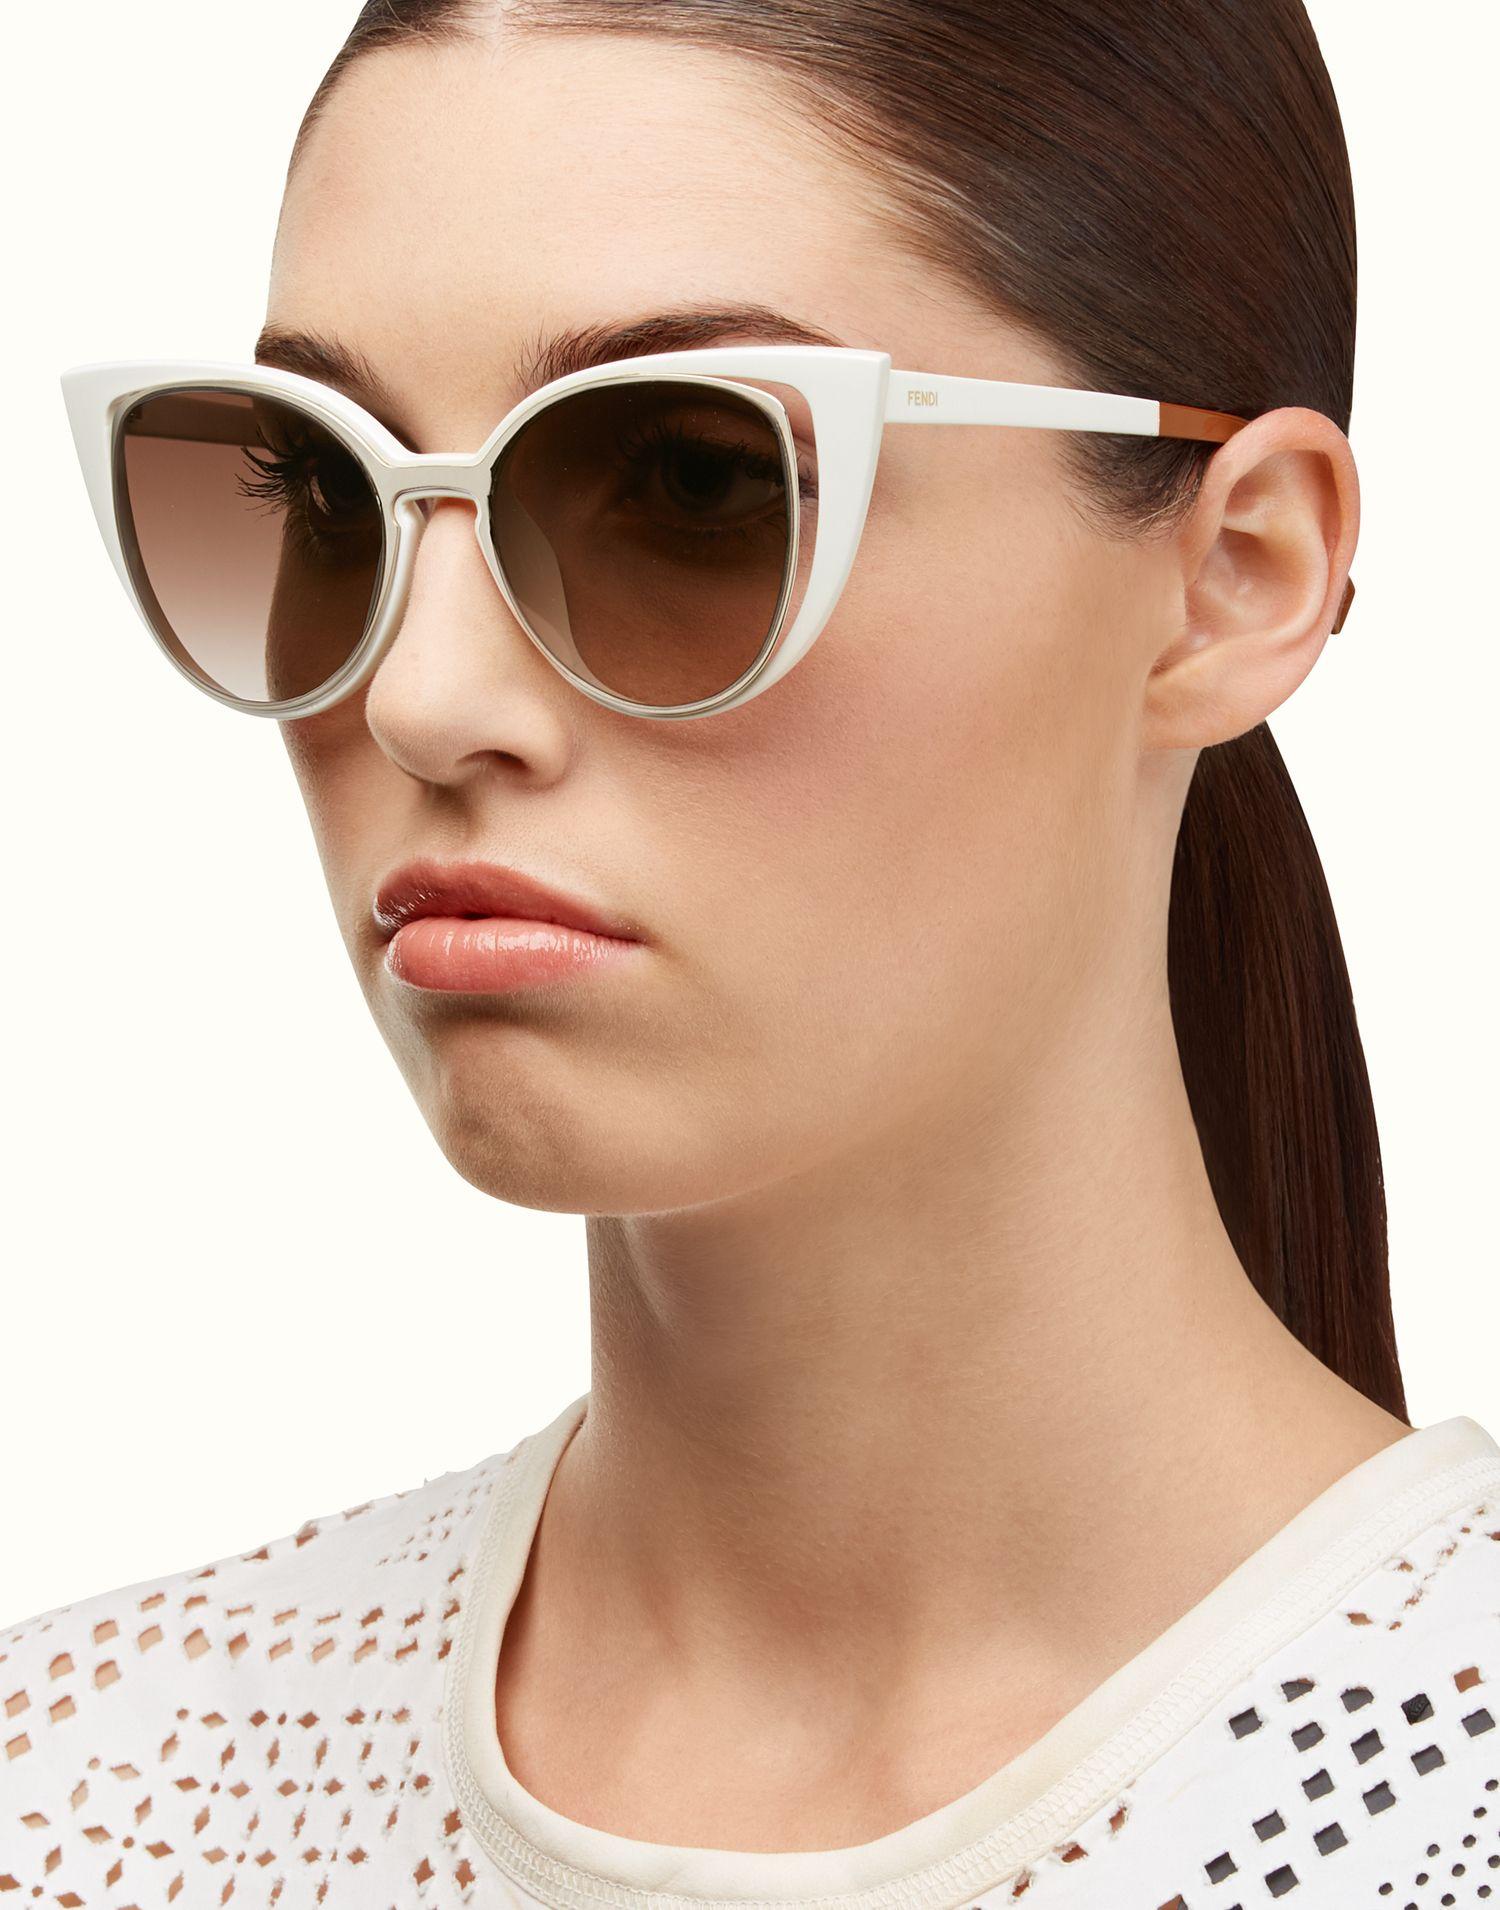 da123b44e8f PARADEYES white cat-eye double frame sunglasses. Ref  FOG2616CWF0EEA ...